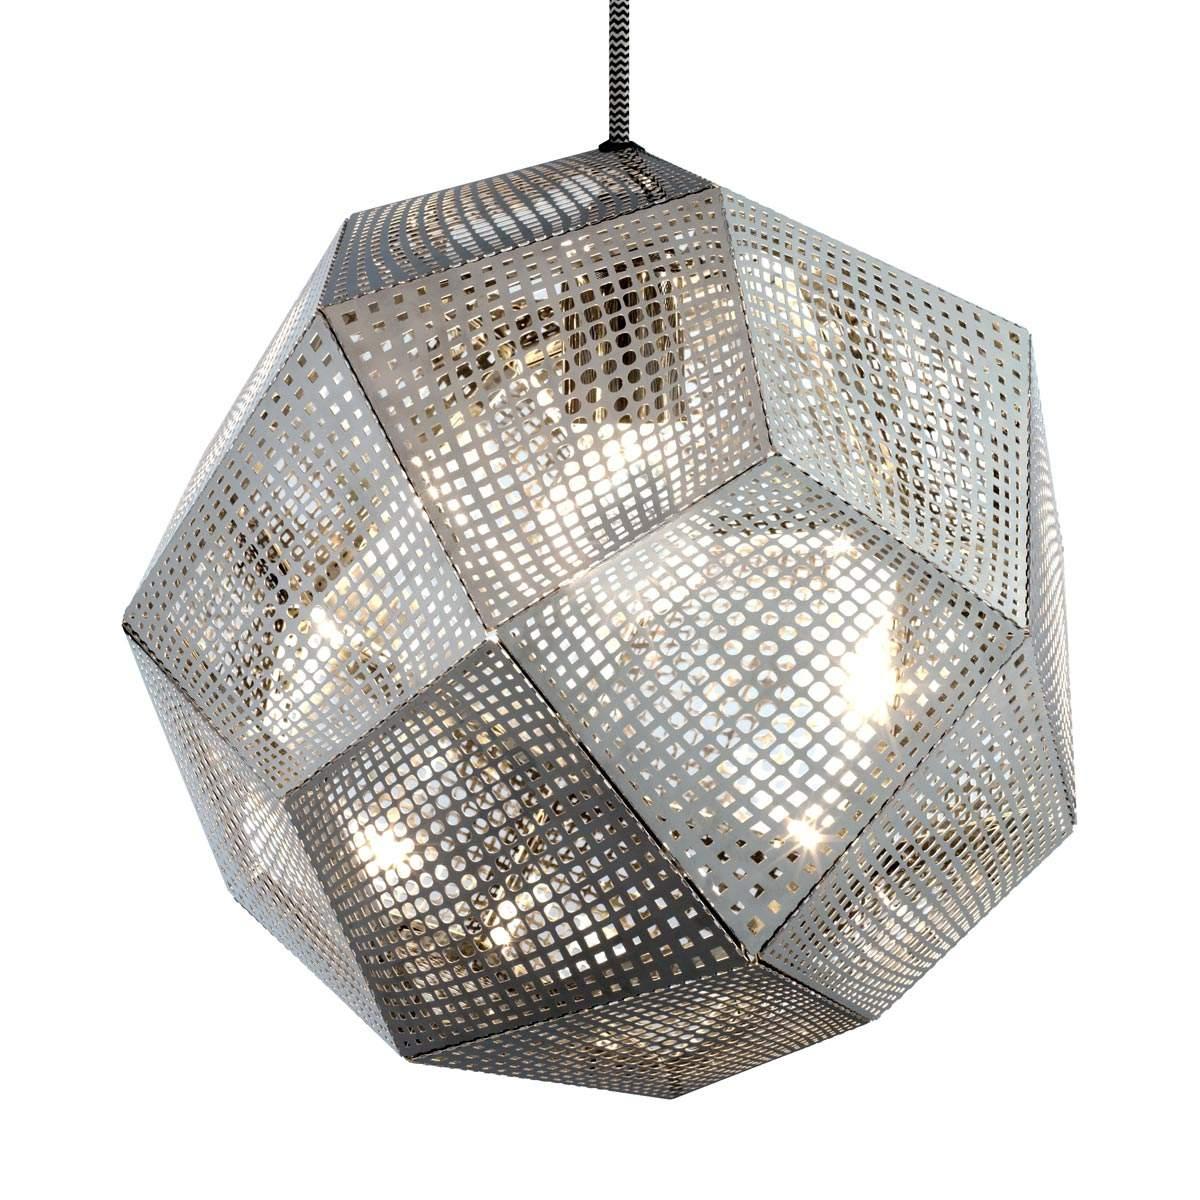 Lampada sosp Etch forma geometrica, acciaio inox Offerte e sconti